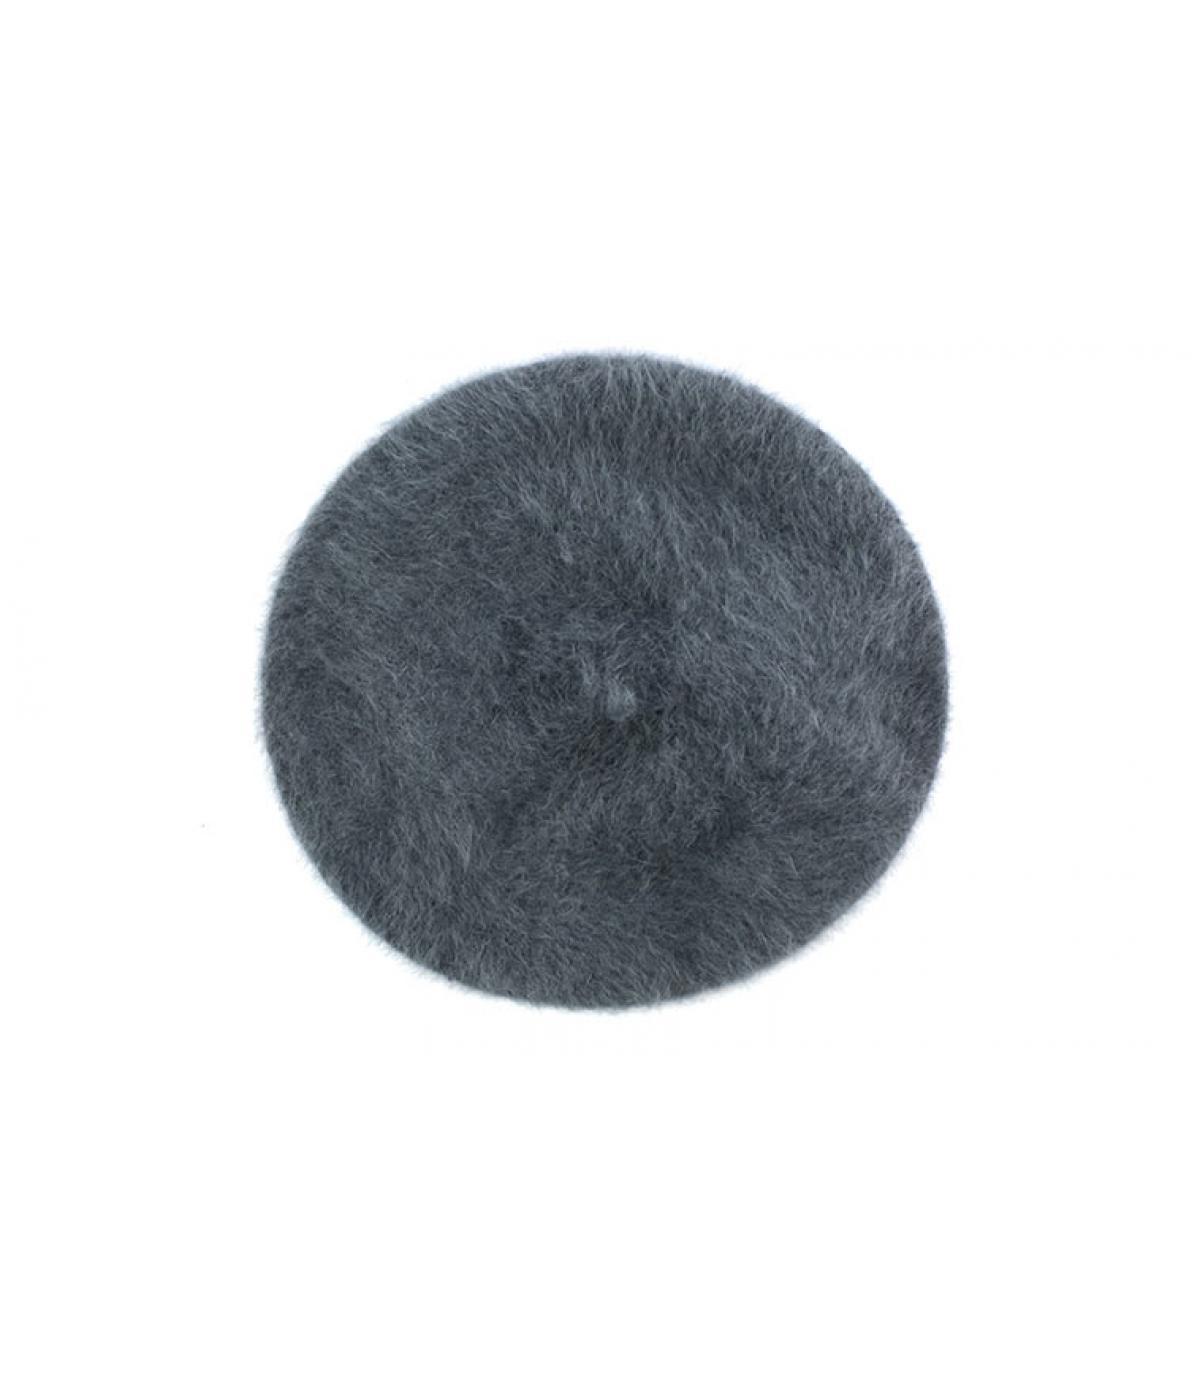 Détails Beret angora grey - image 2